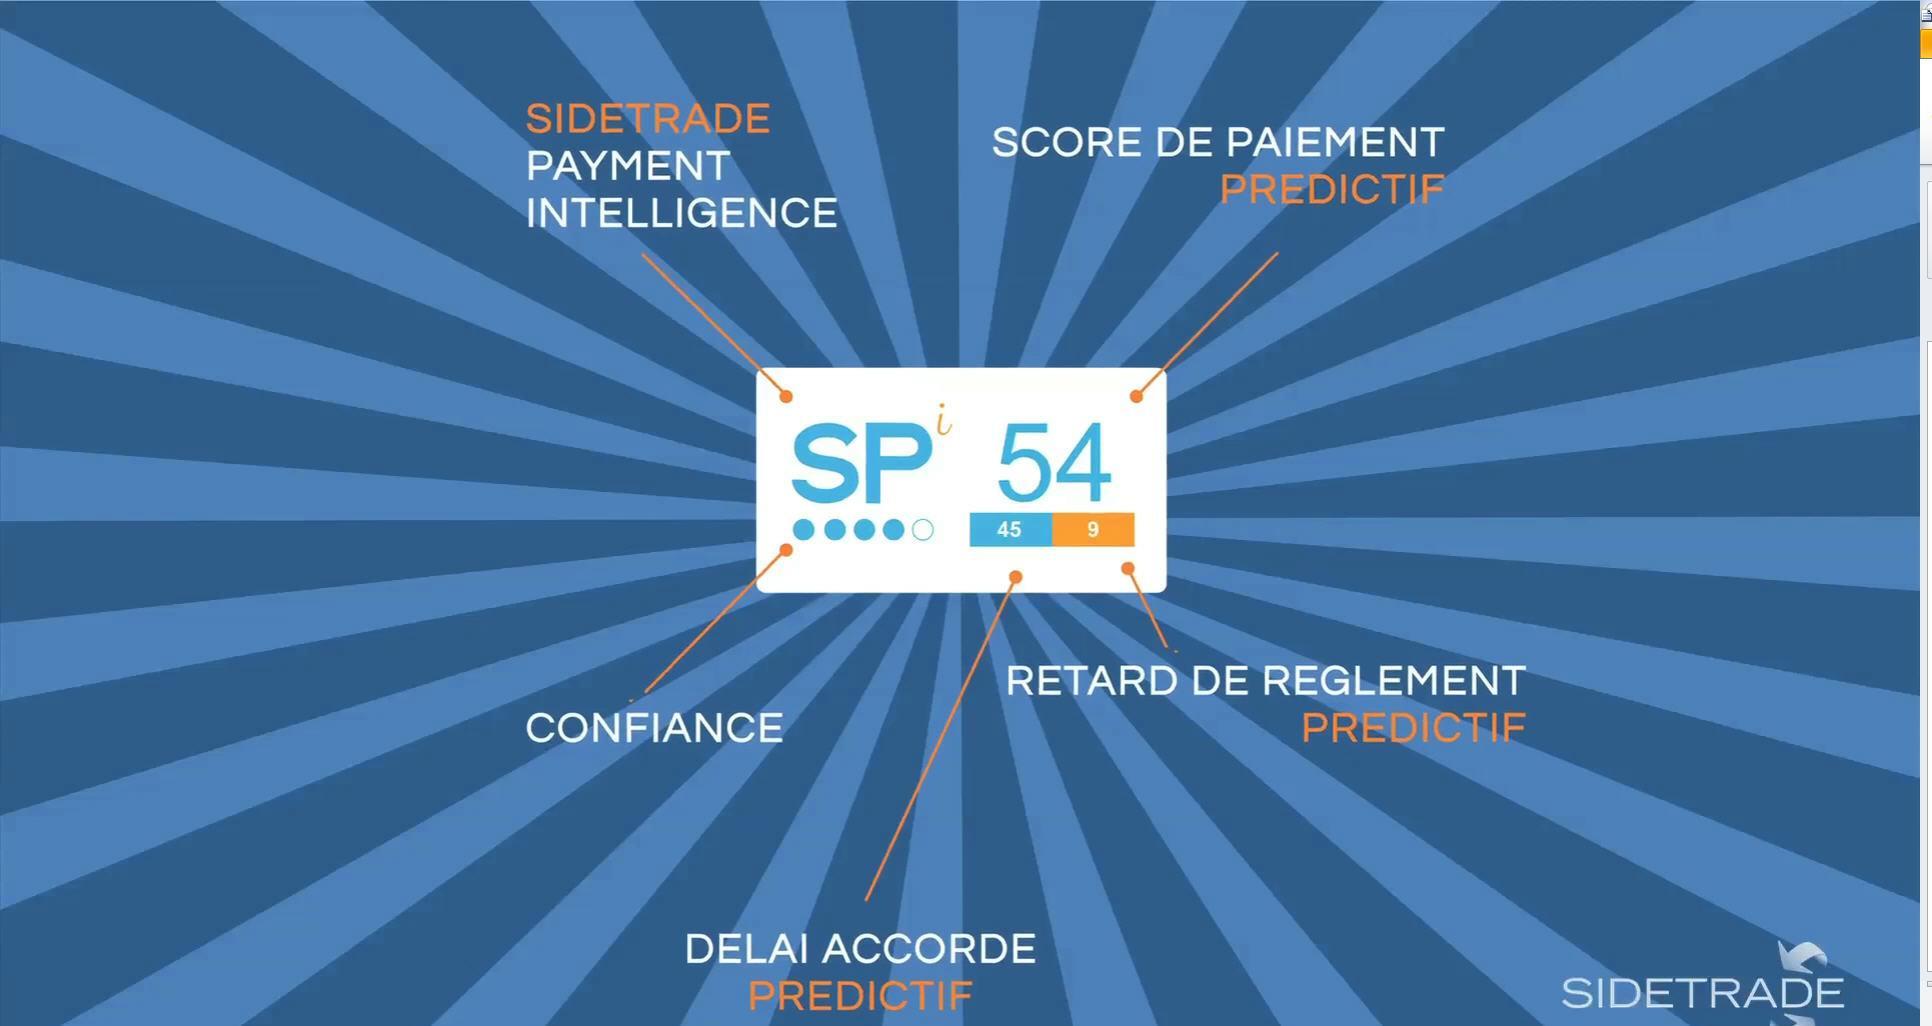 Sidetrade Sales & Marketing-Sidetrade Payment Intelligence - screen shot  7